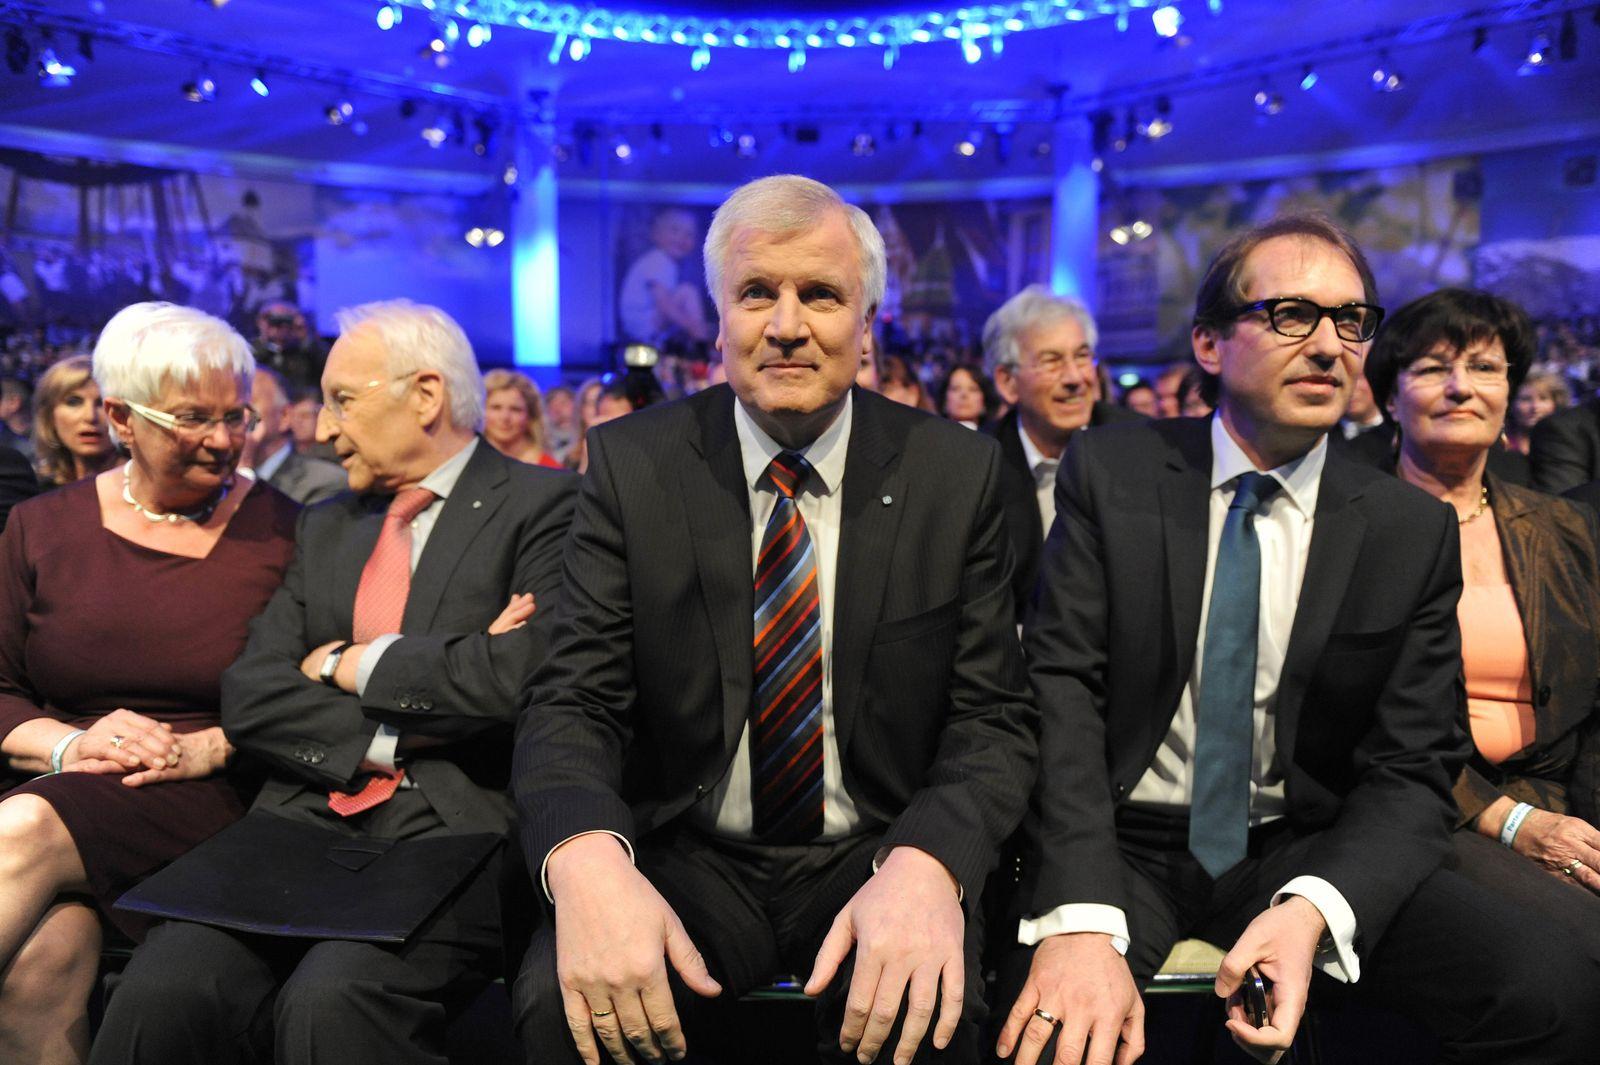 Parteikonvent der CSU Seehofer